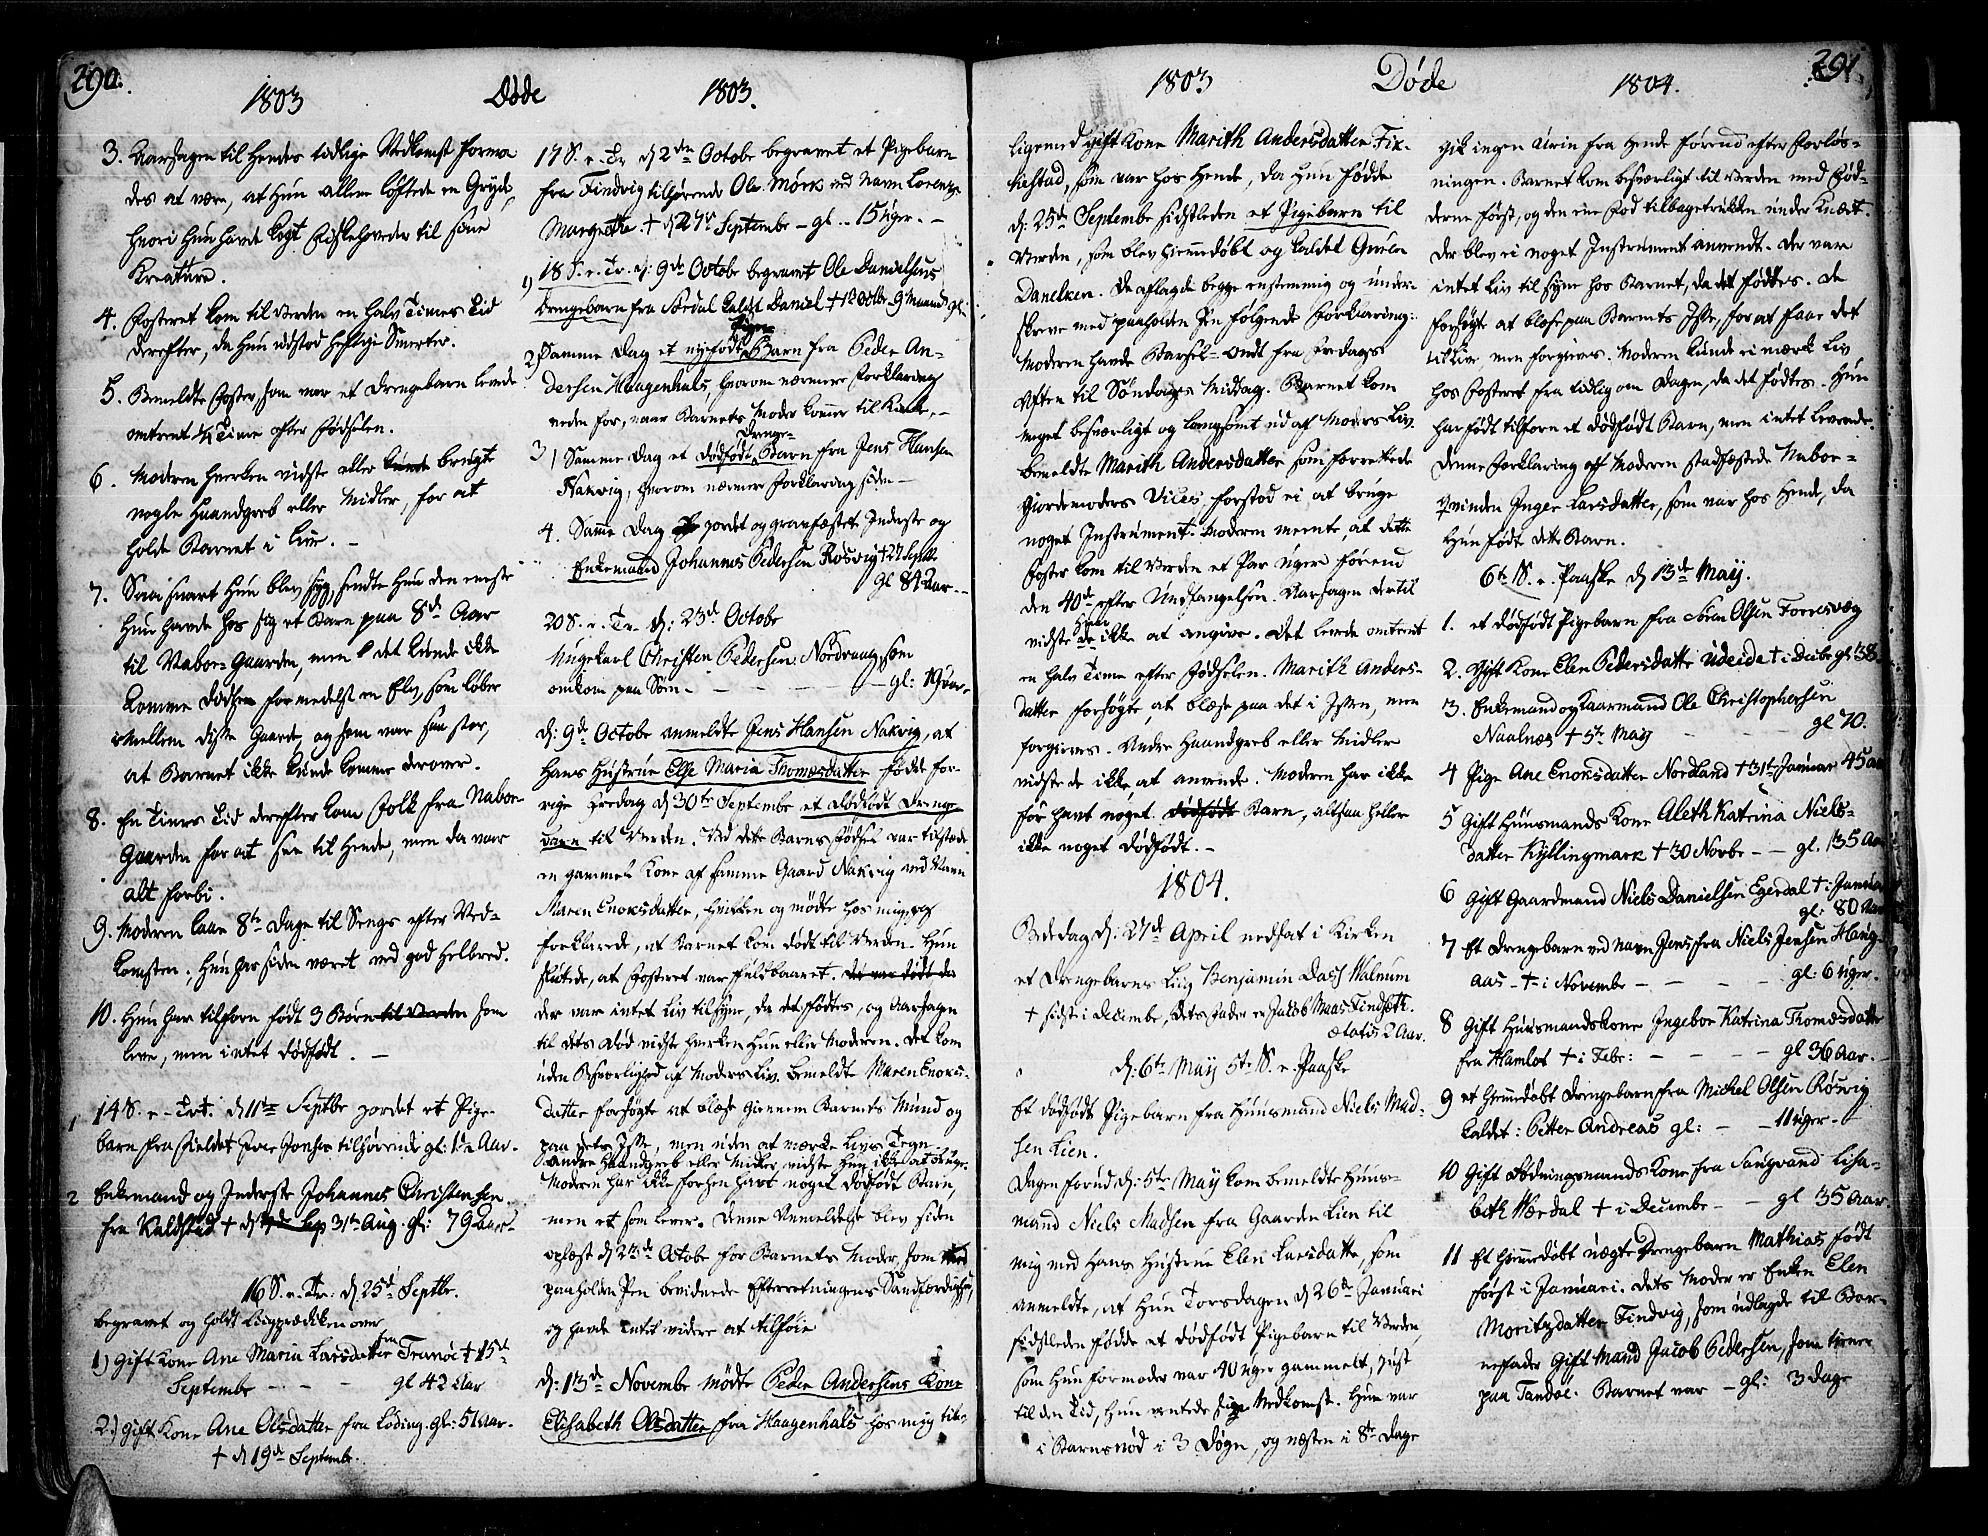 SAT, Ministerialprotokoller, klokkerbøker og fødselsregistre - Nordland, 859/L0841: Ministerialbok nr. 859A01, 1766-1821, s. 290-291